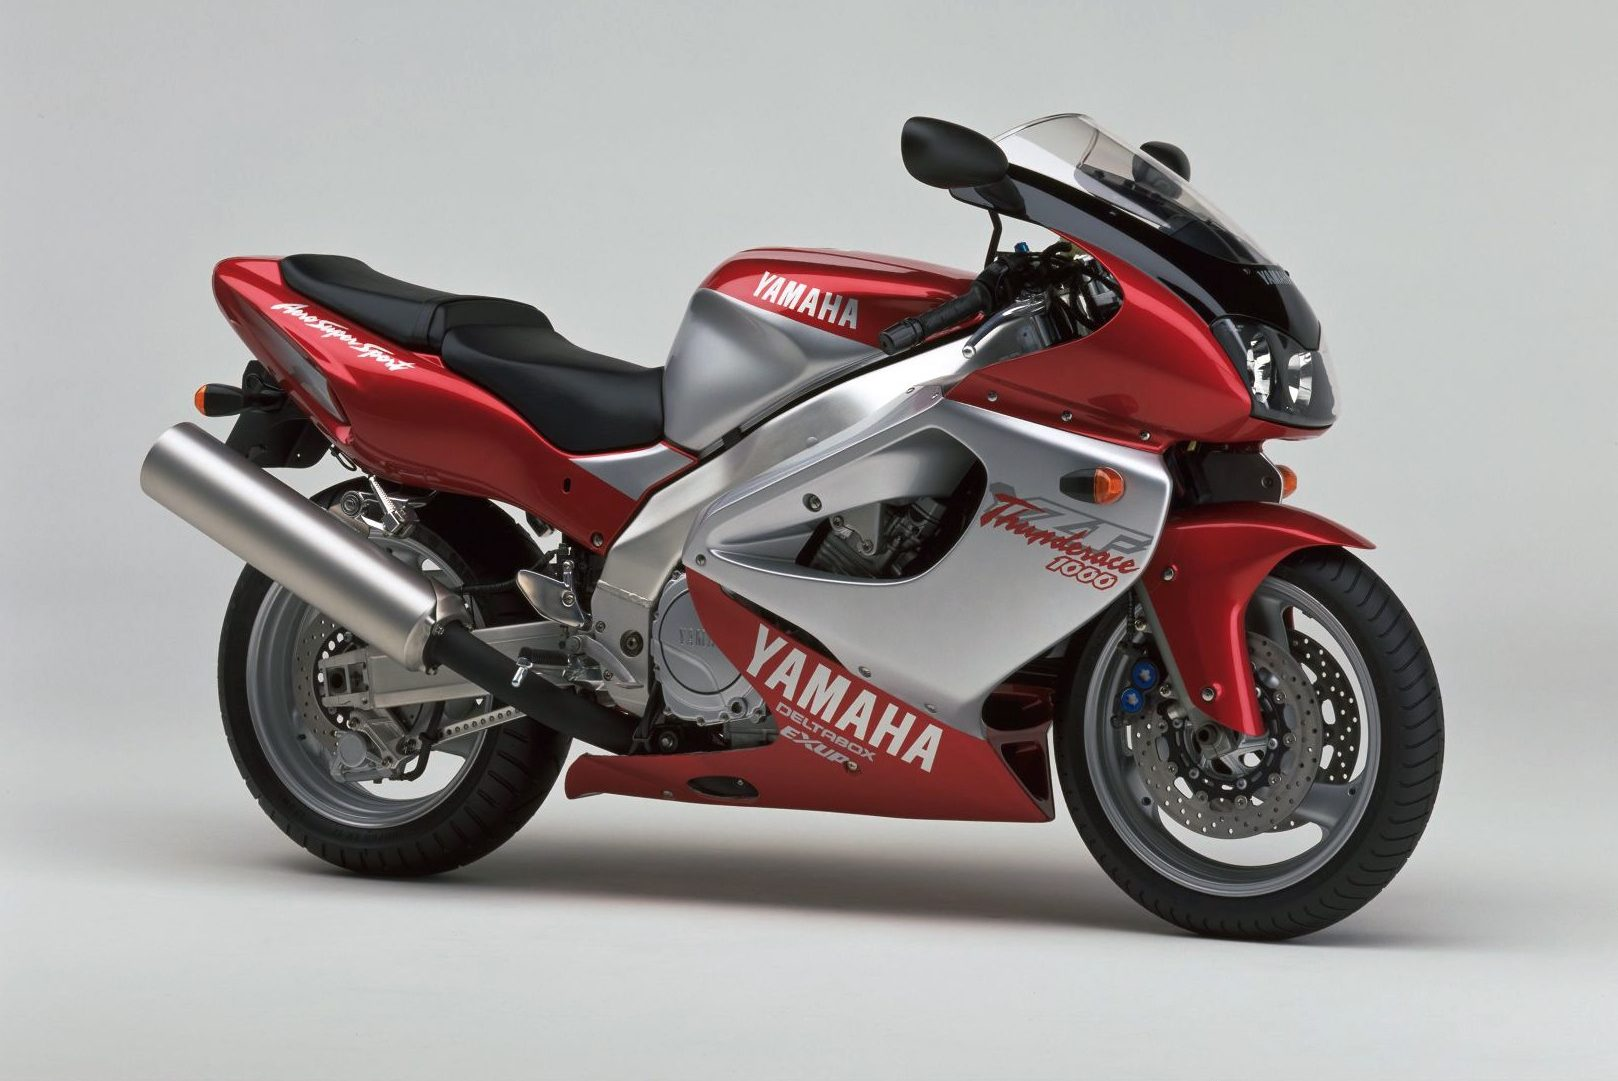 Yamaha YZF 1000R Thunderace 1